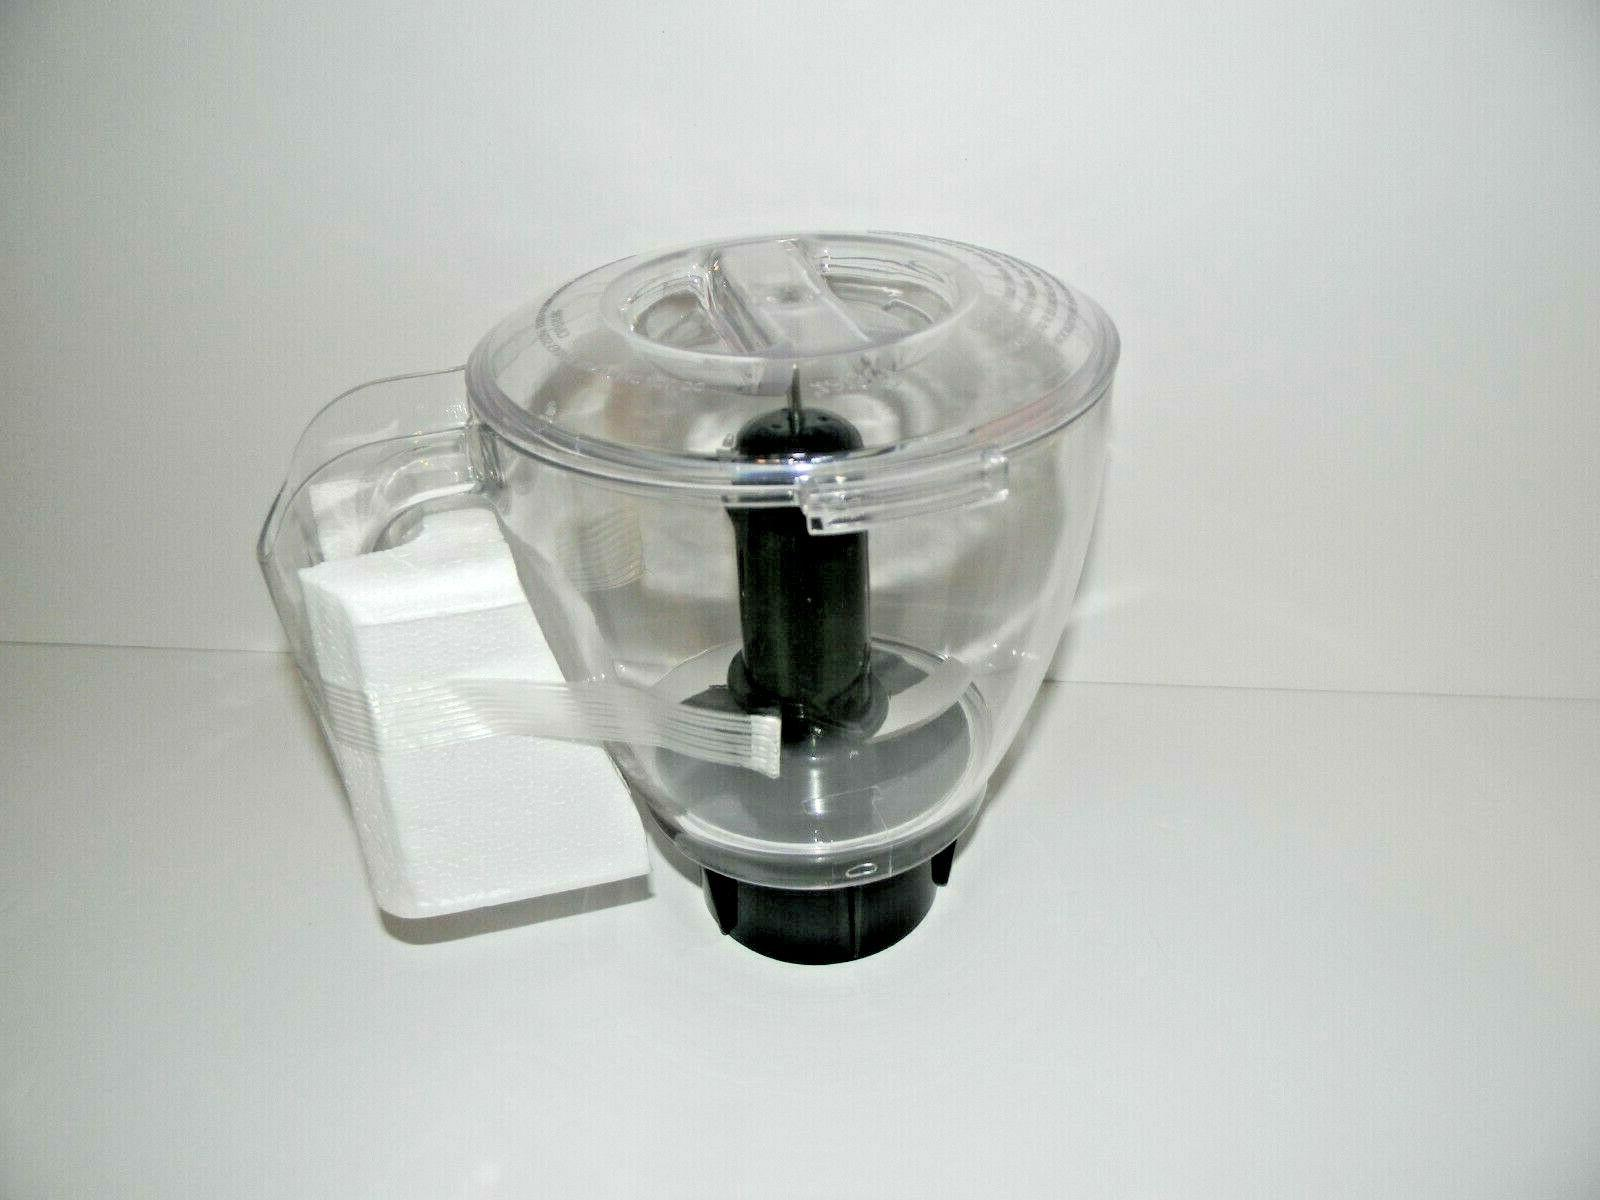 blender food processor attachment bowl lid chopper